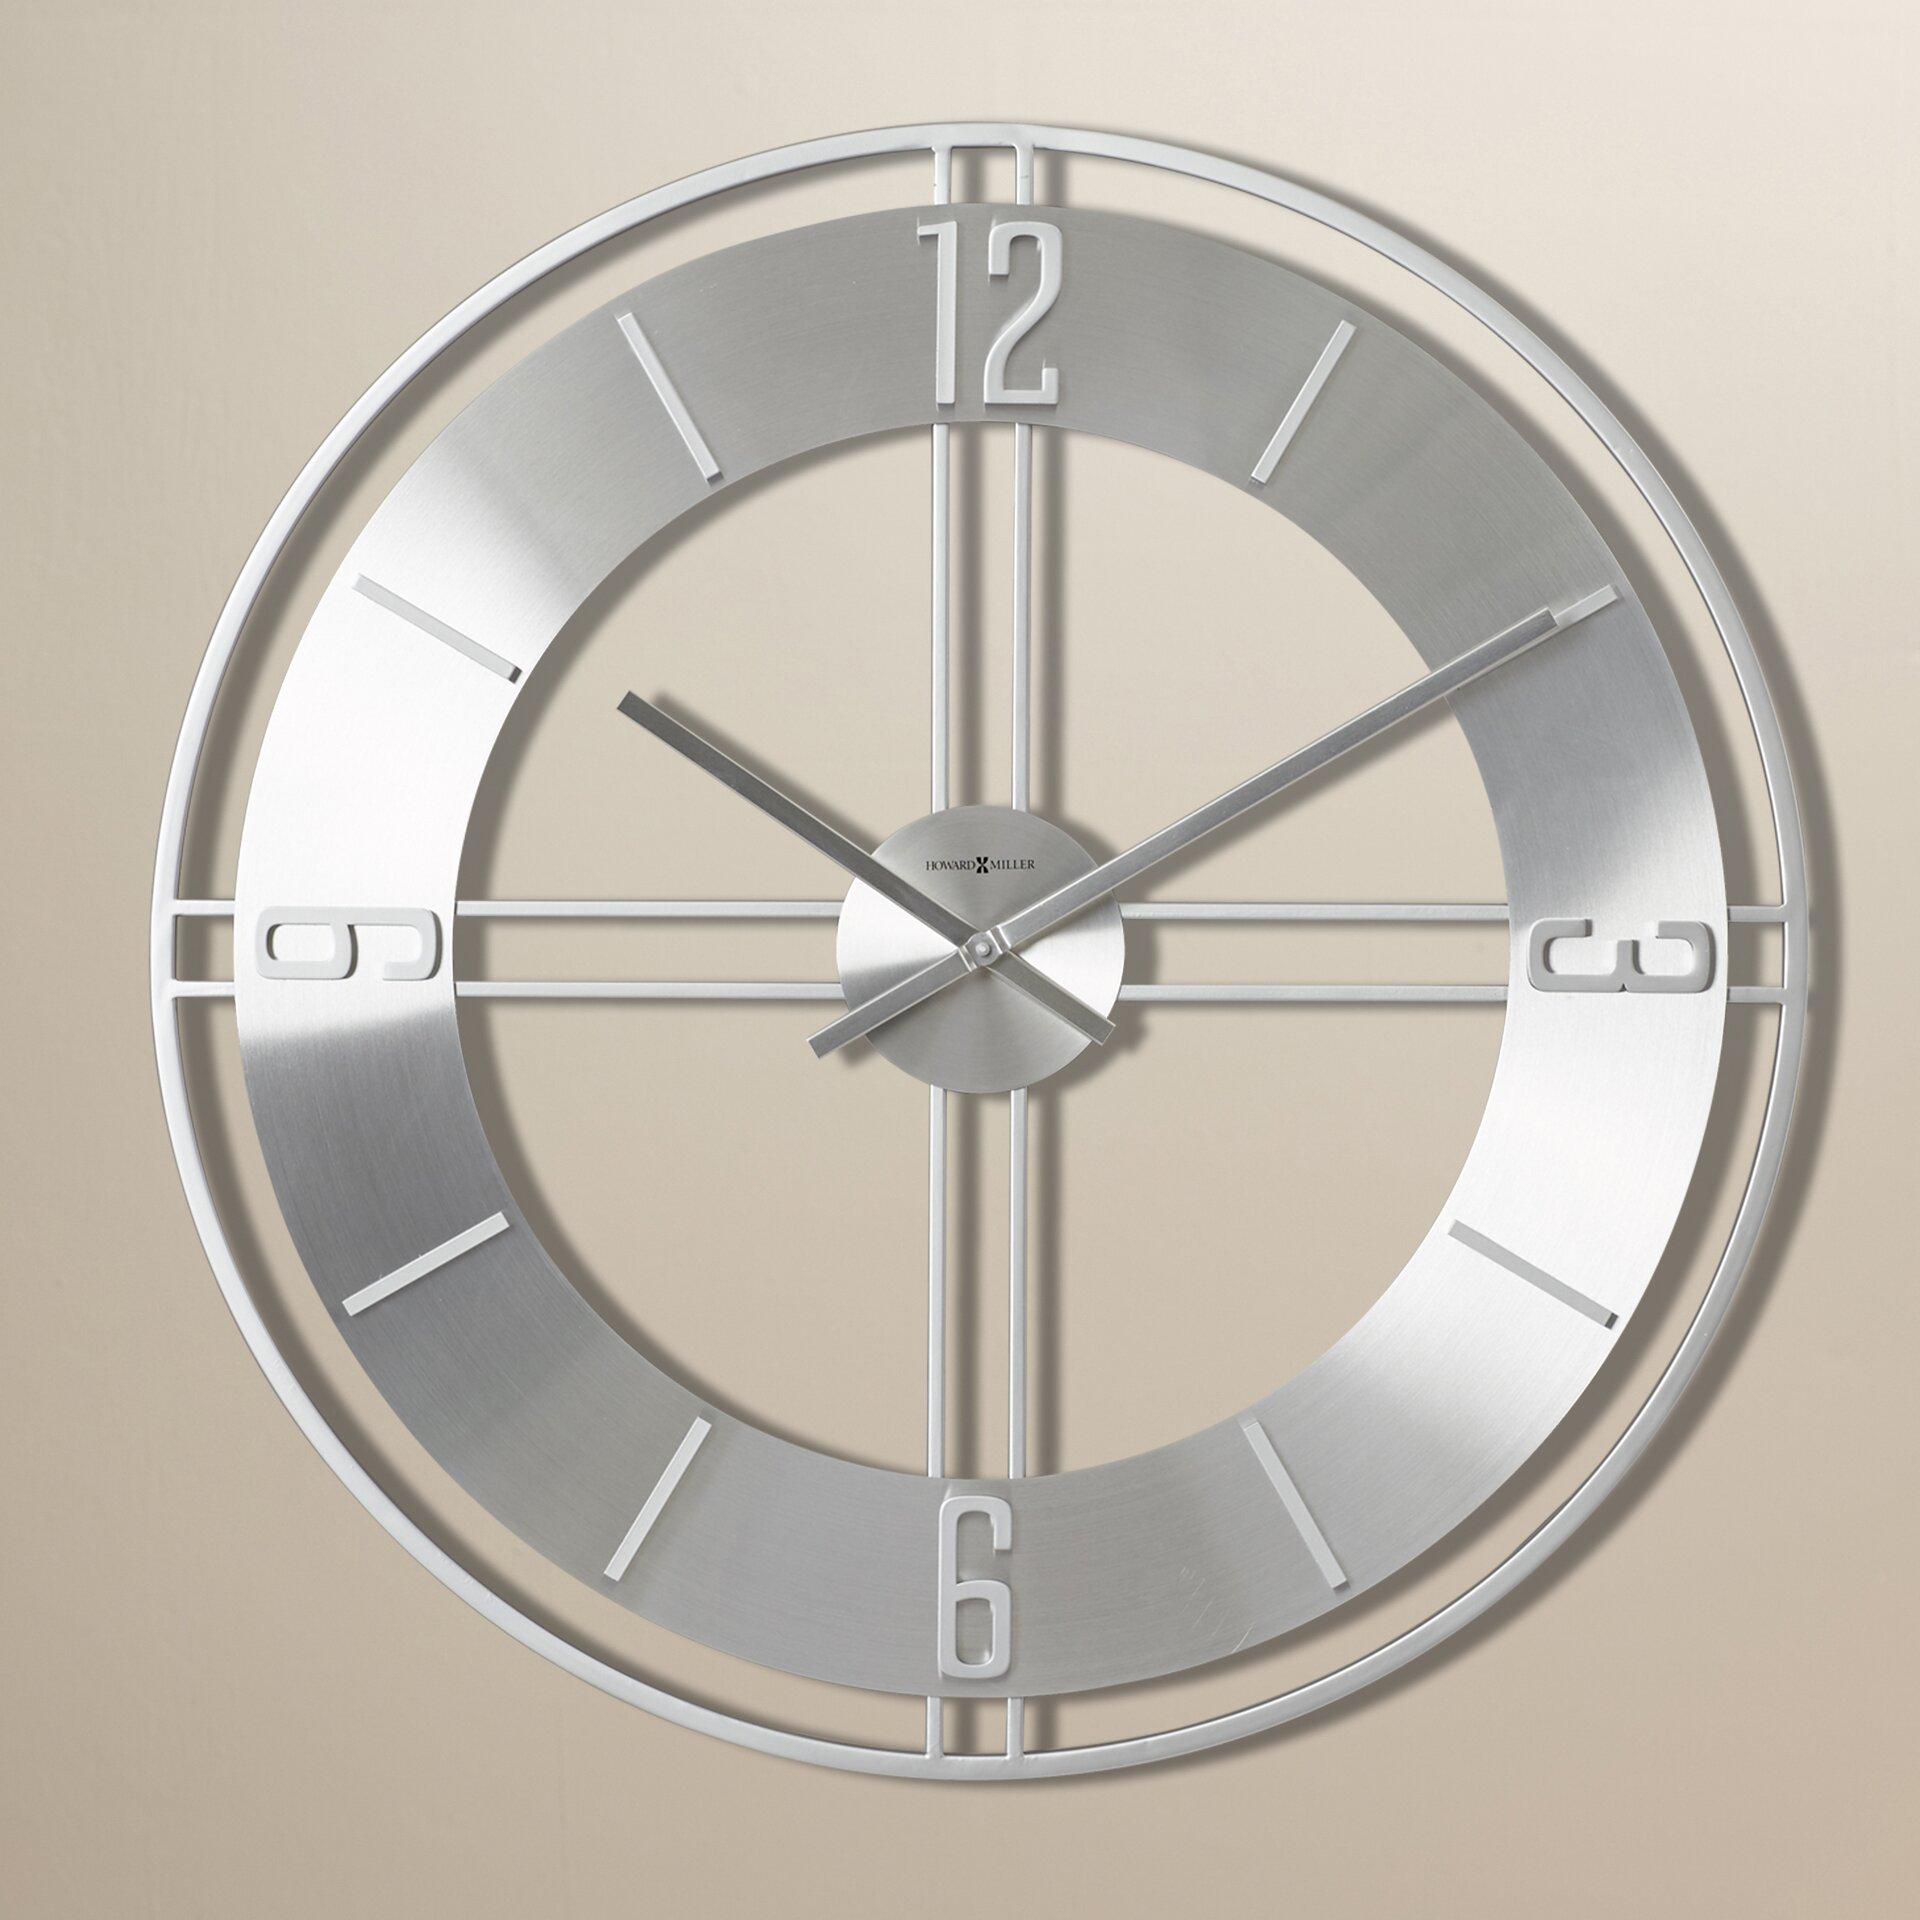 howard miller oversized 30 stapleton wall clock reviews wayfair. Black Bedroom Furniture Sets. Home Design Ideas